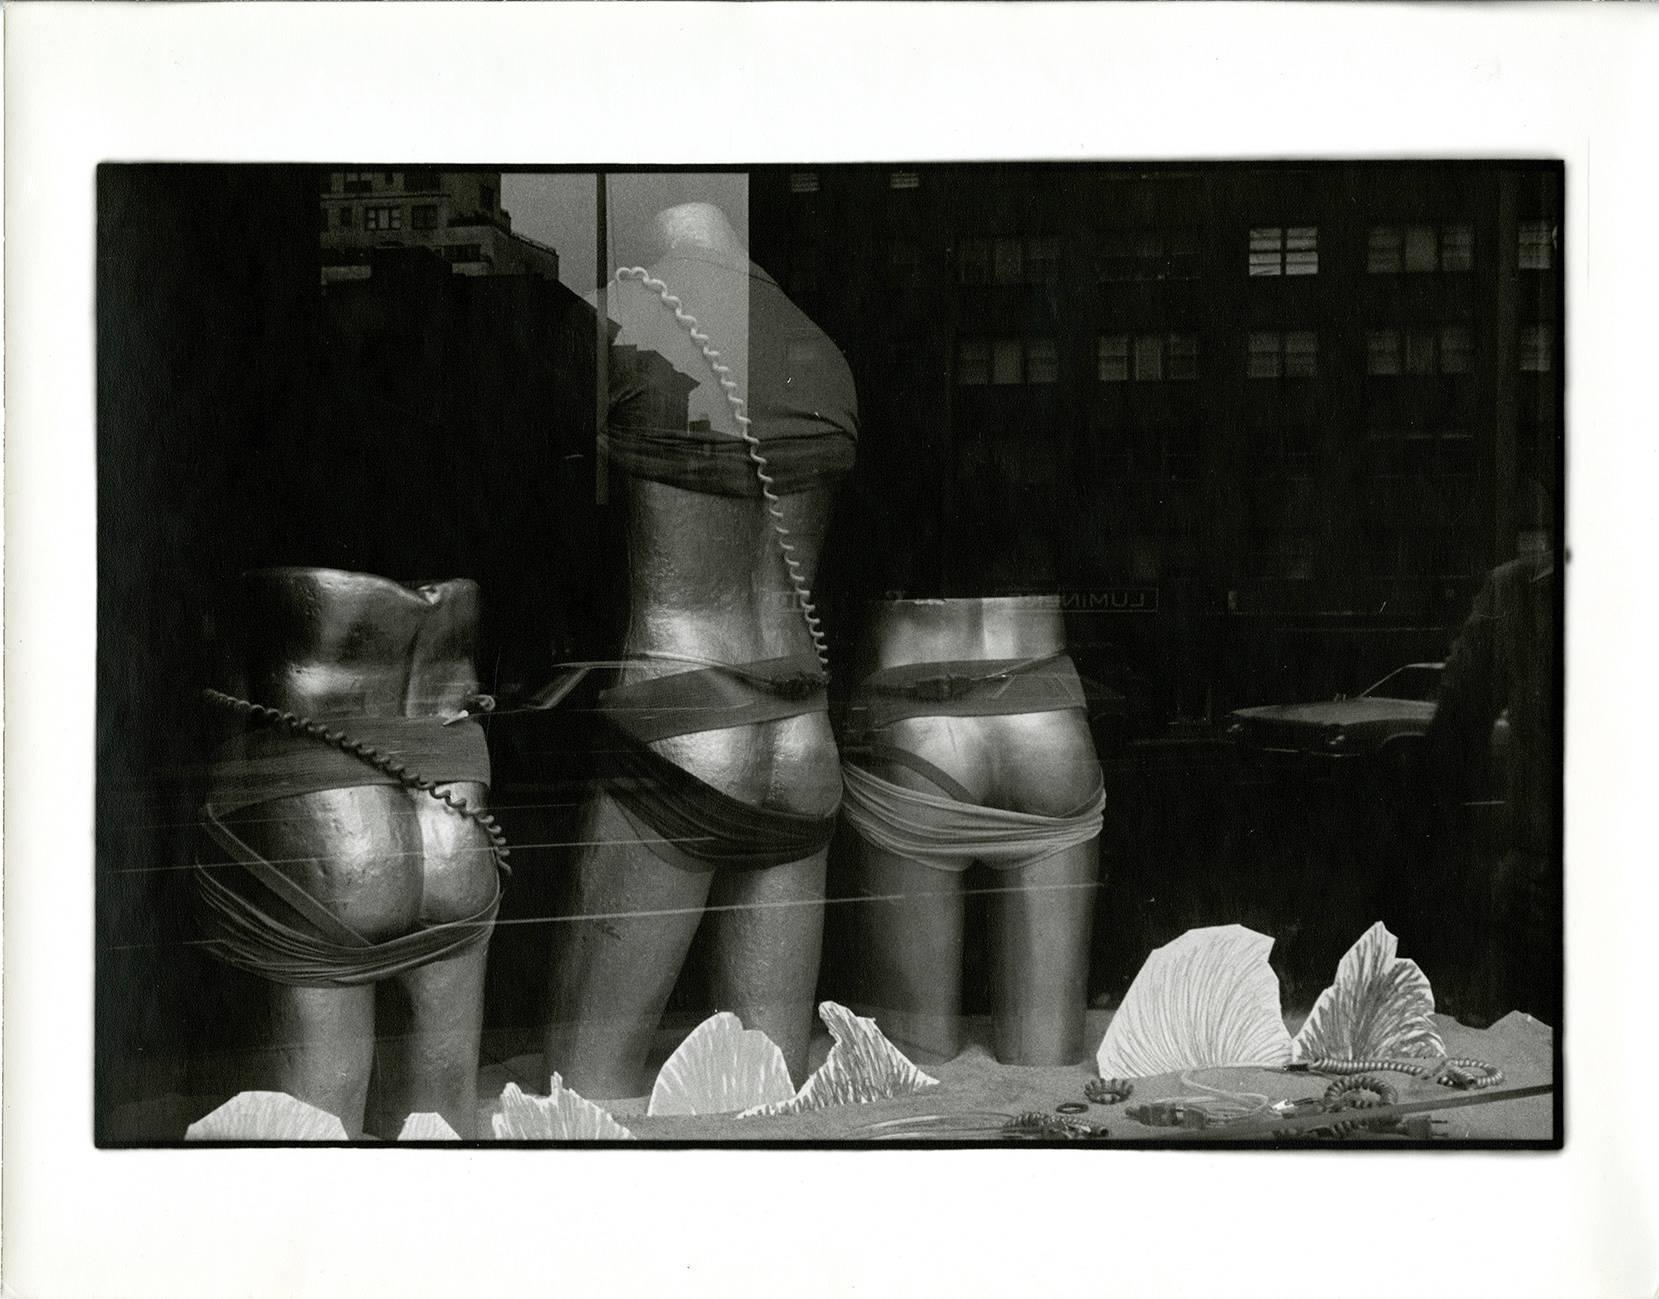 Chelsea Manhattan Photograph, 'Chelsea Reflections'